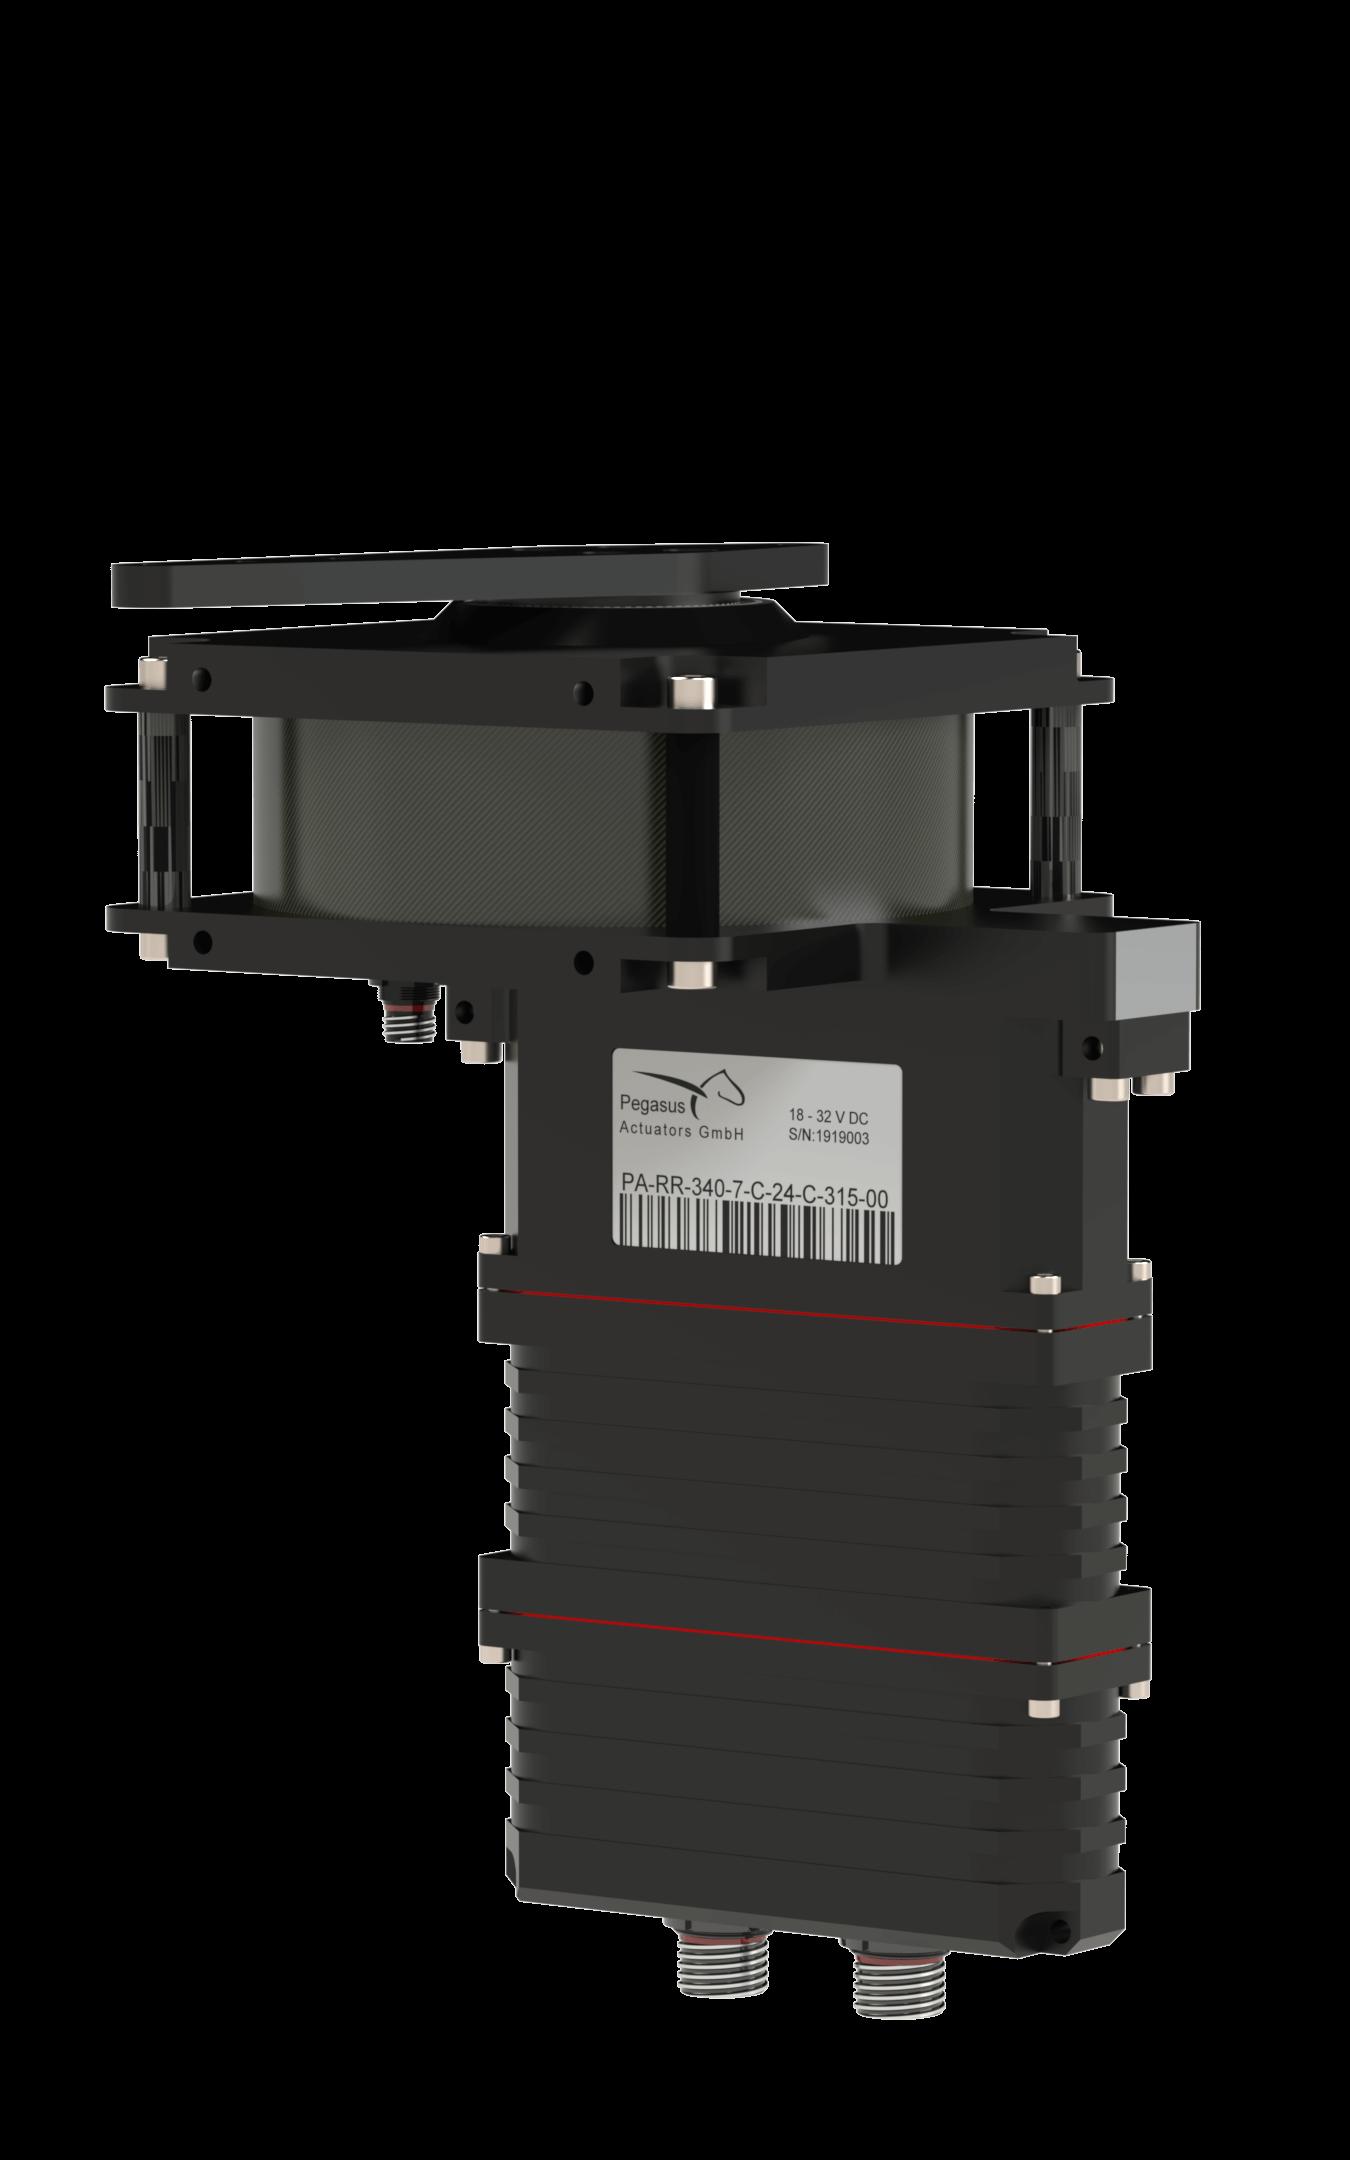 PA-RR-340-7-OPV Actuators